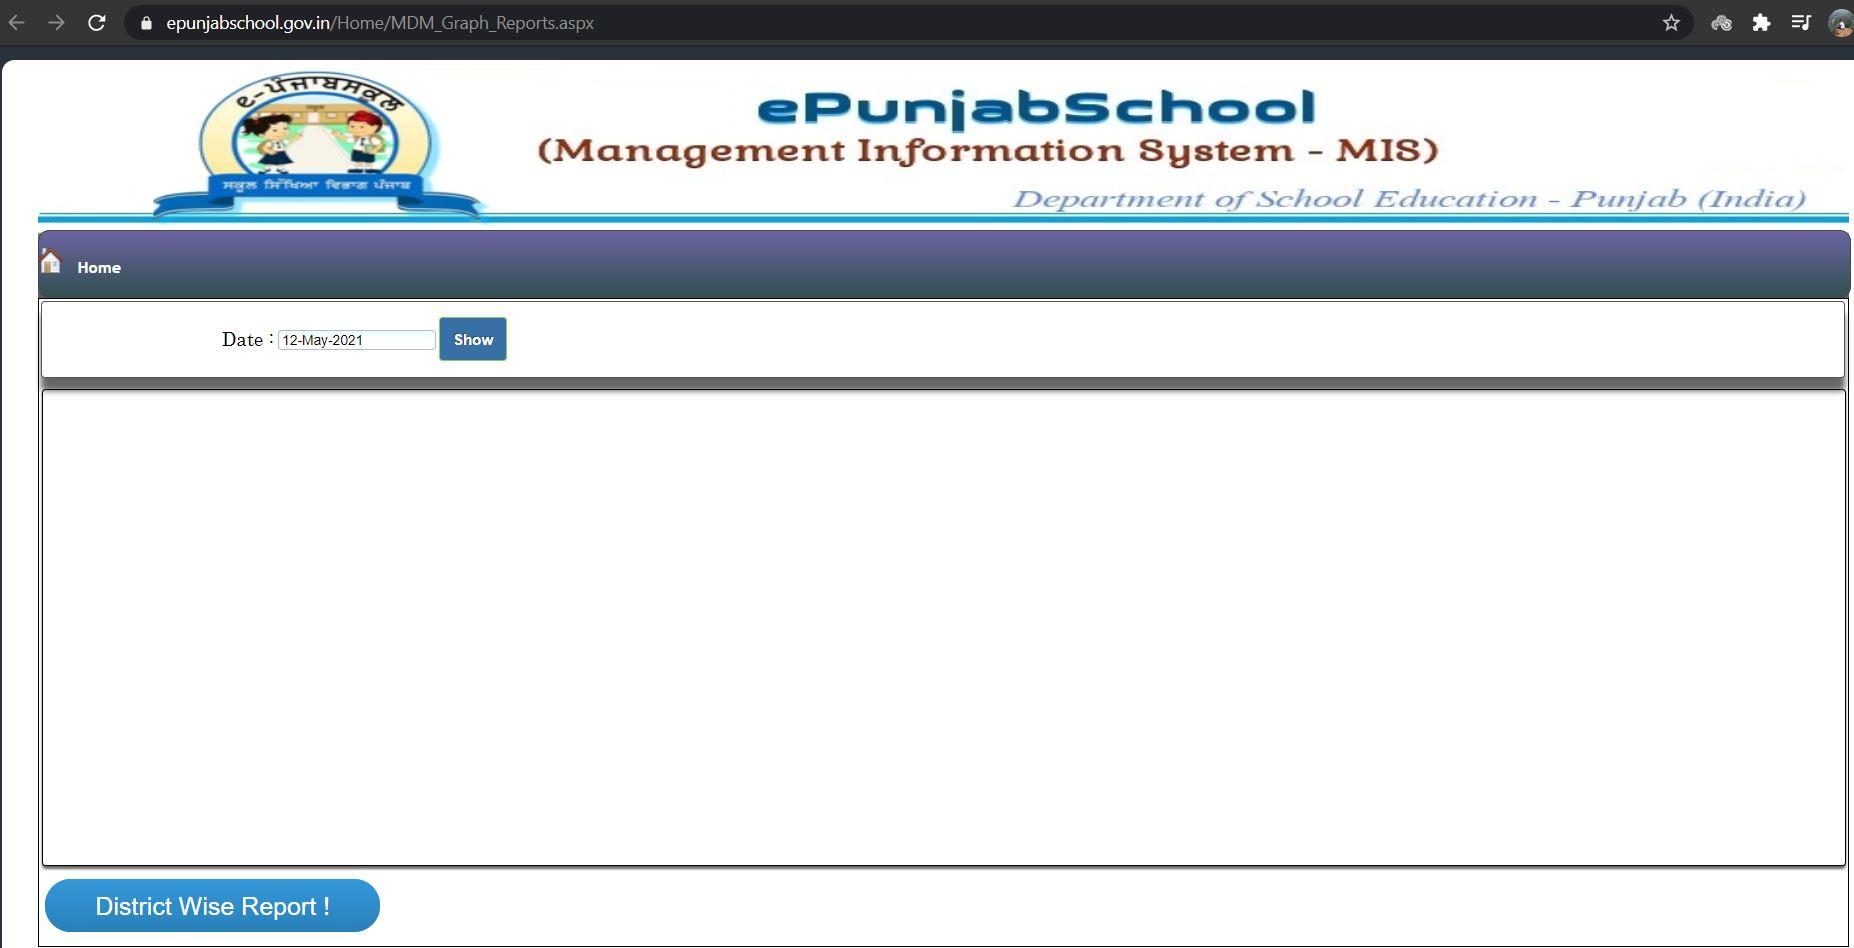 ePunjab School MDM report